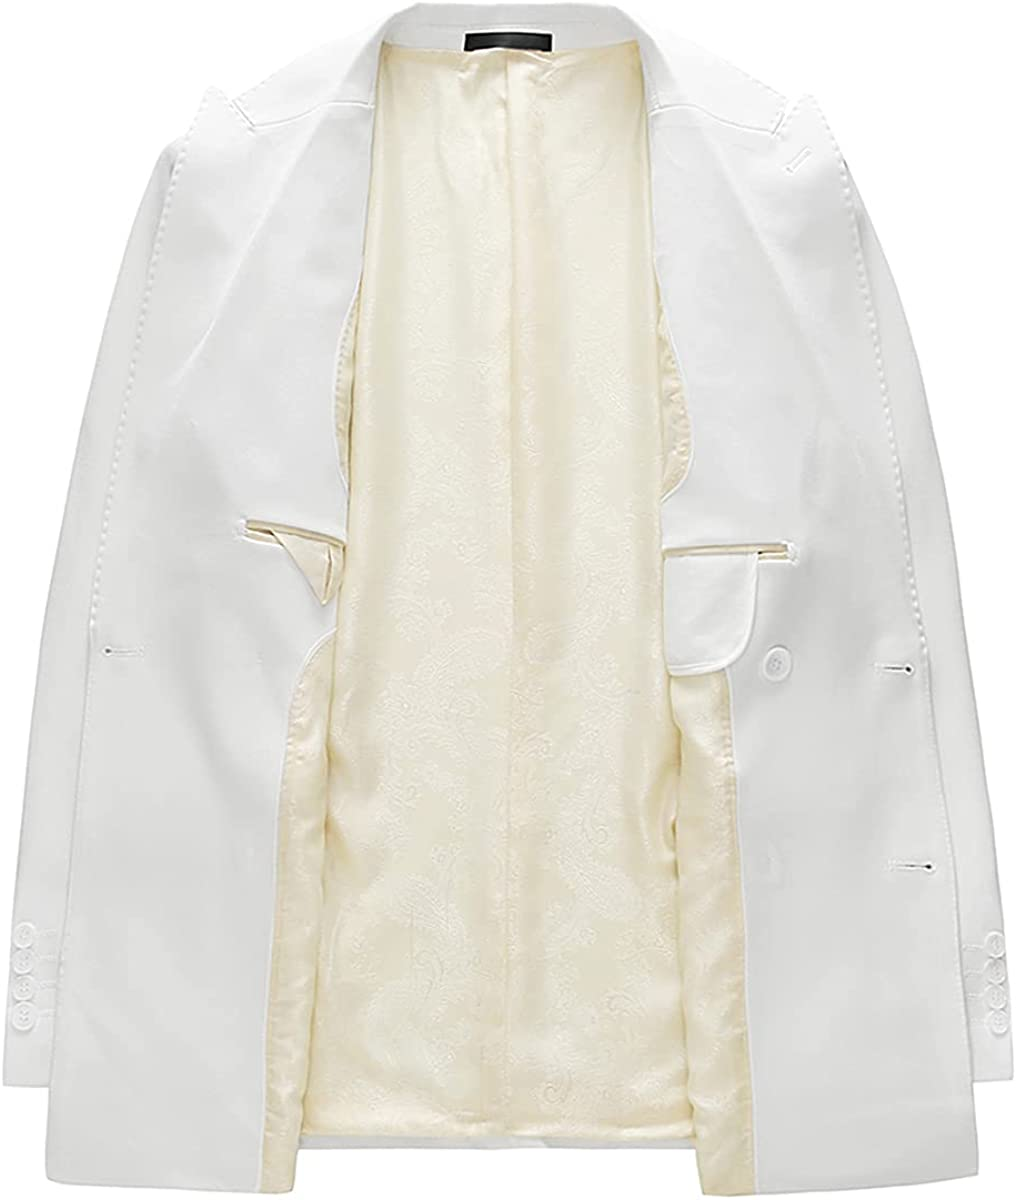 Mens Suits Slim Fit 3 Piece Formal Double Breasted Jacket Blazer Vest Pants Set Prom Wedding Tuxedo Suits